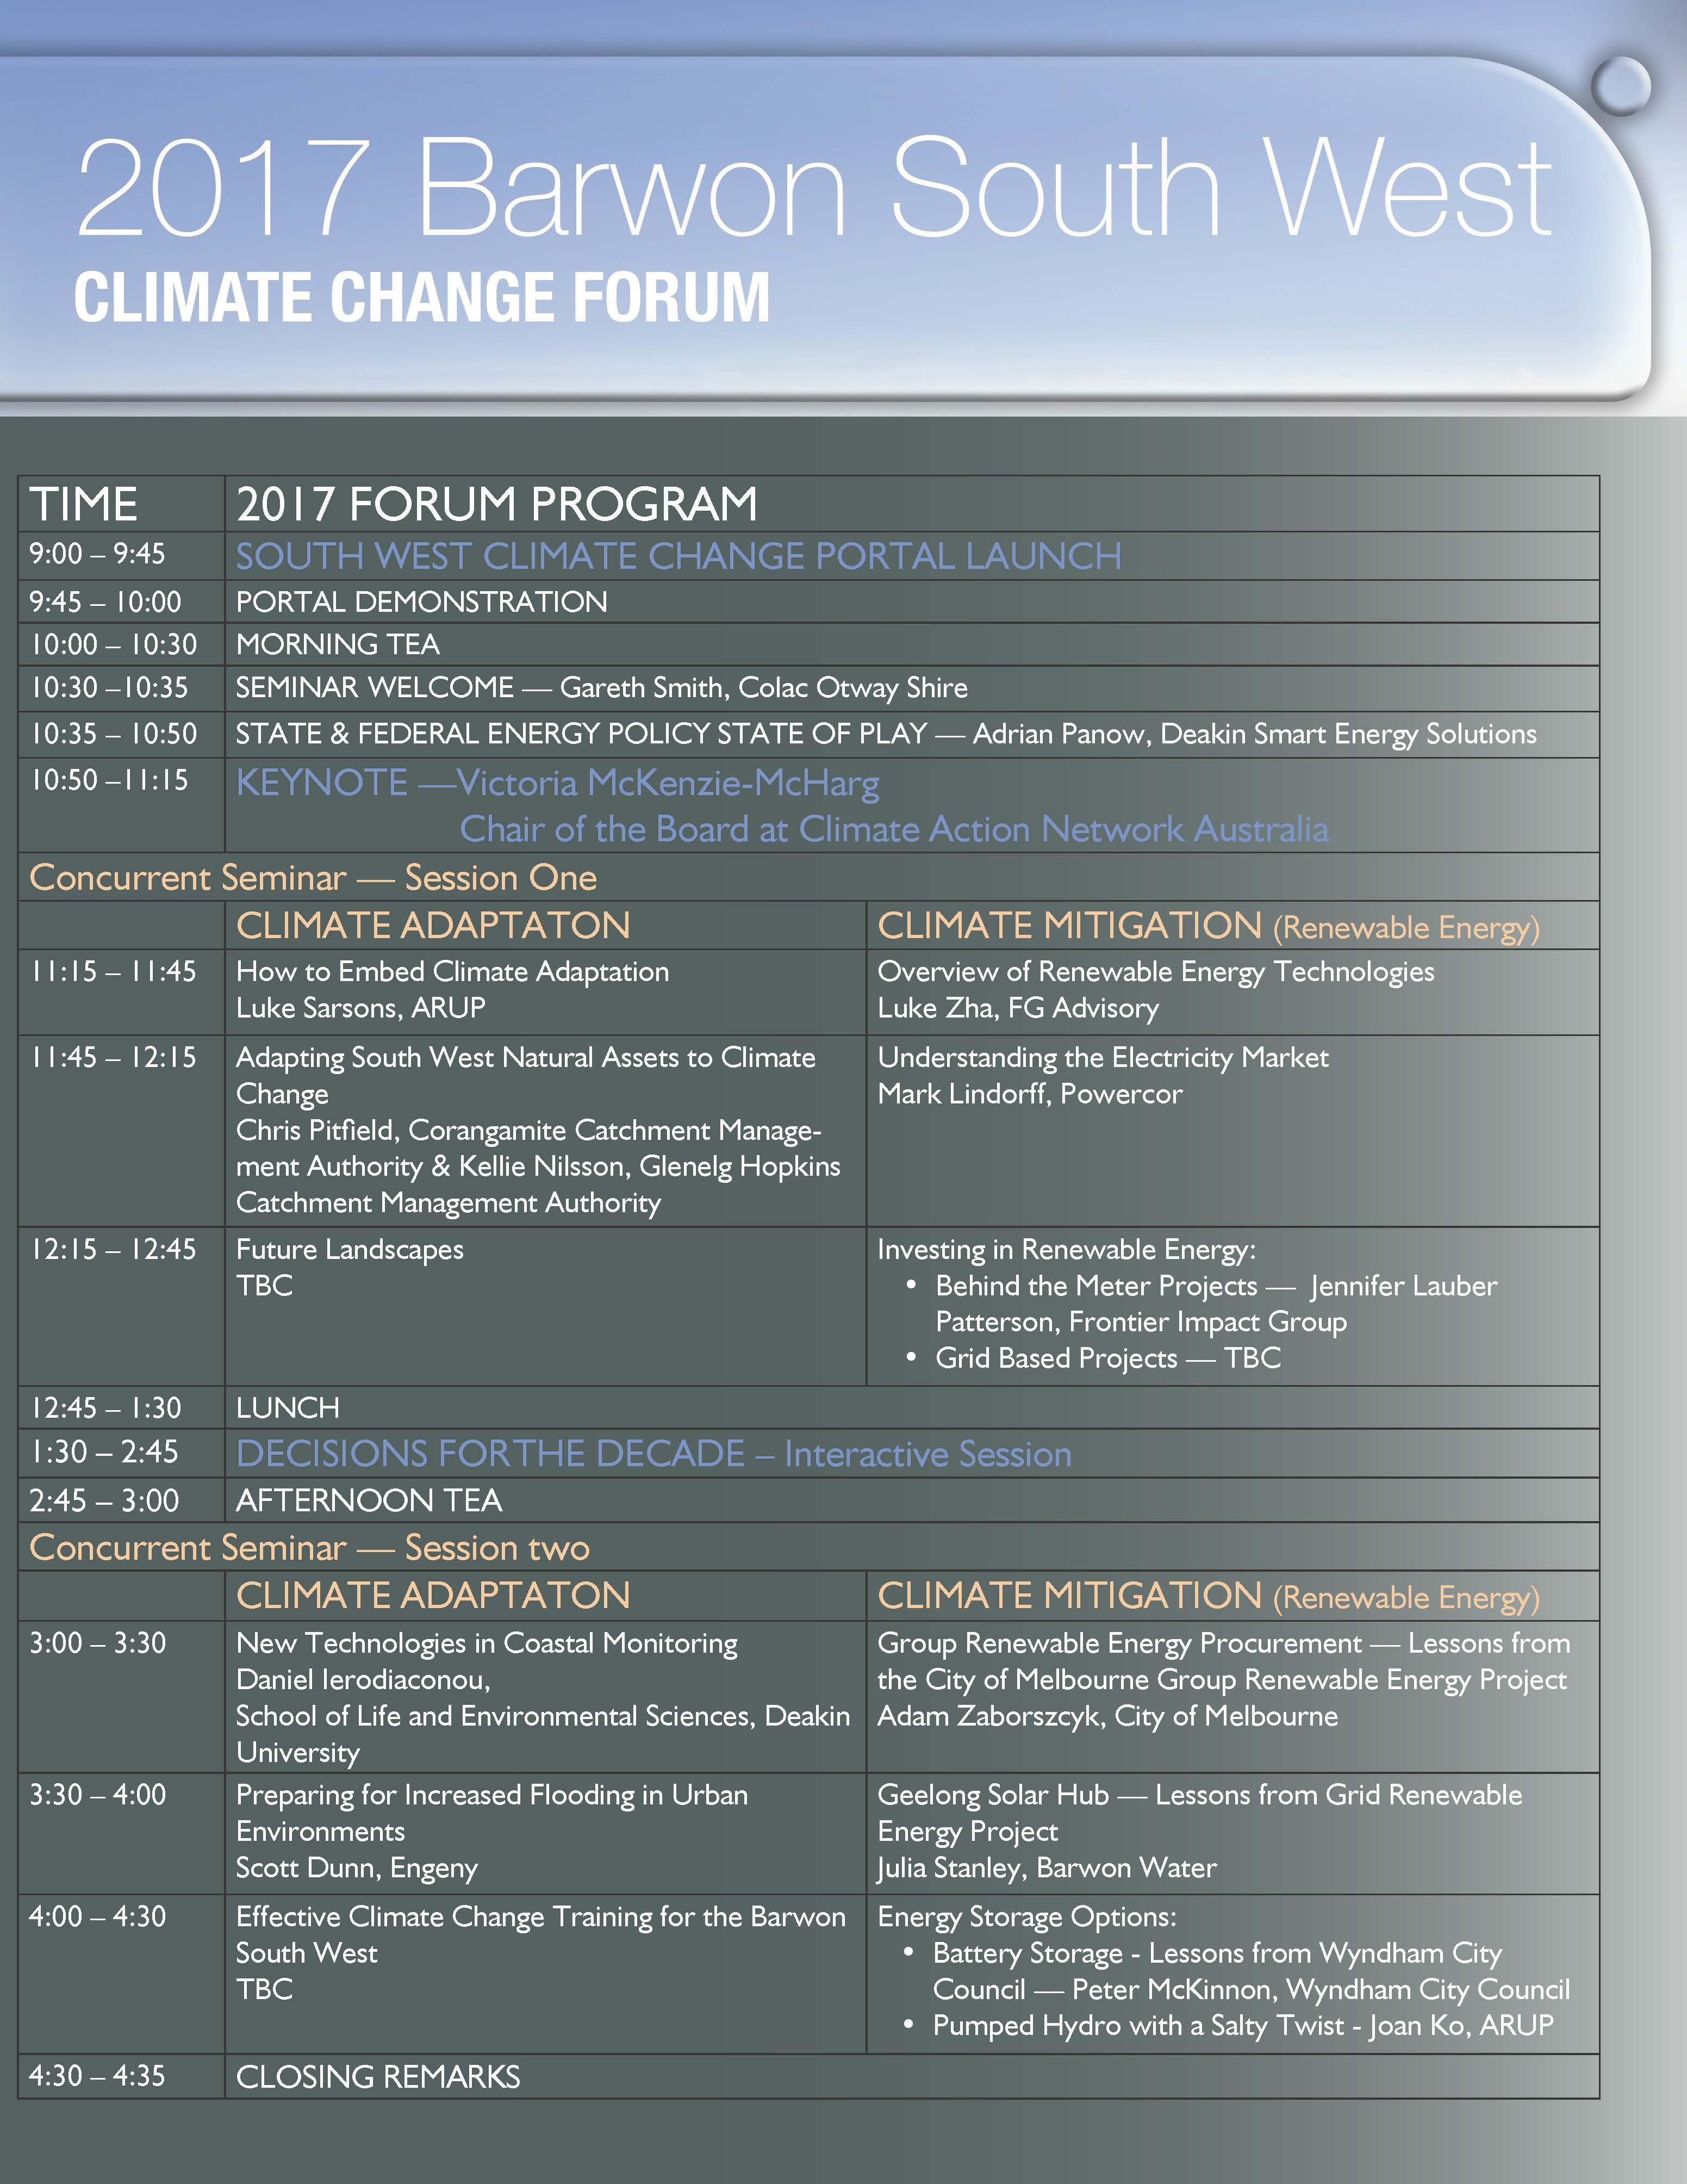 Barwon South West Climate Change Forum Program